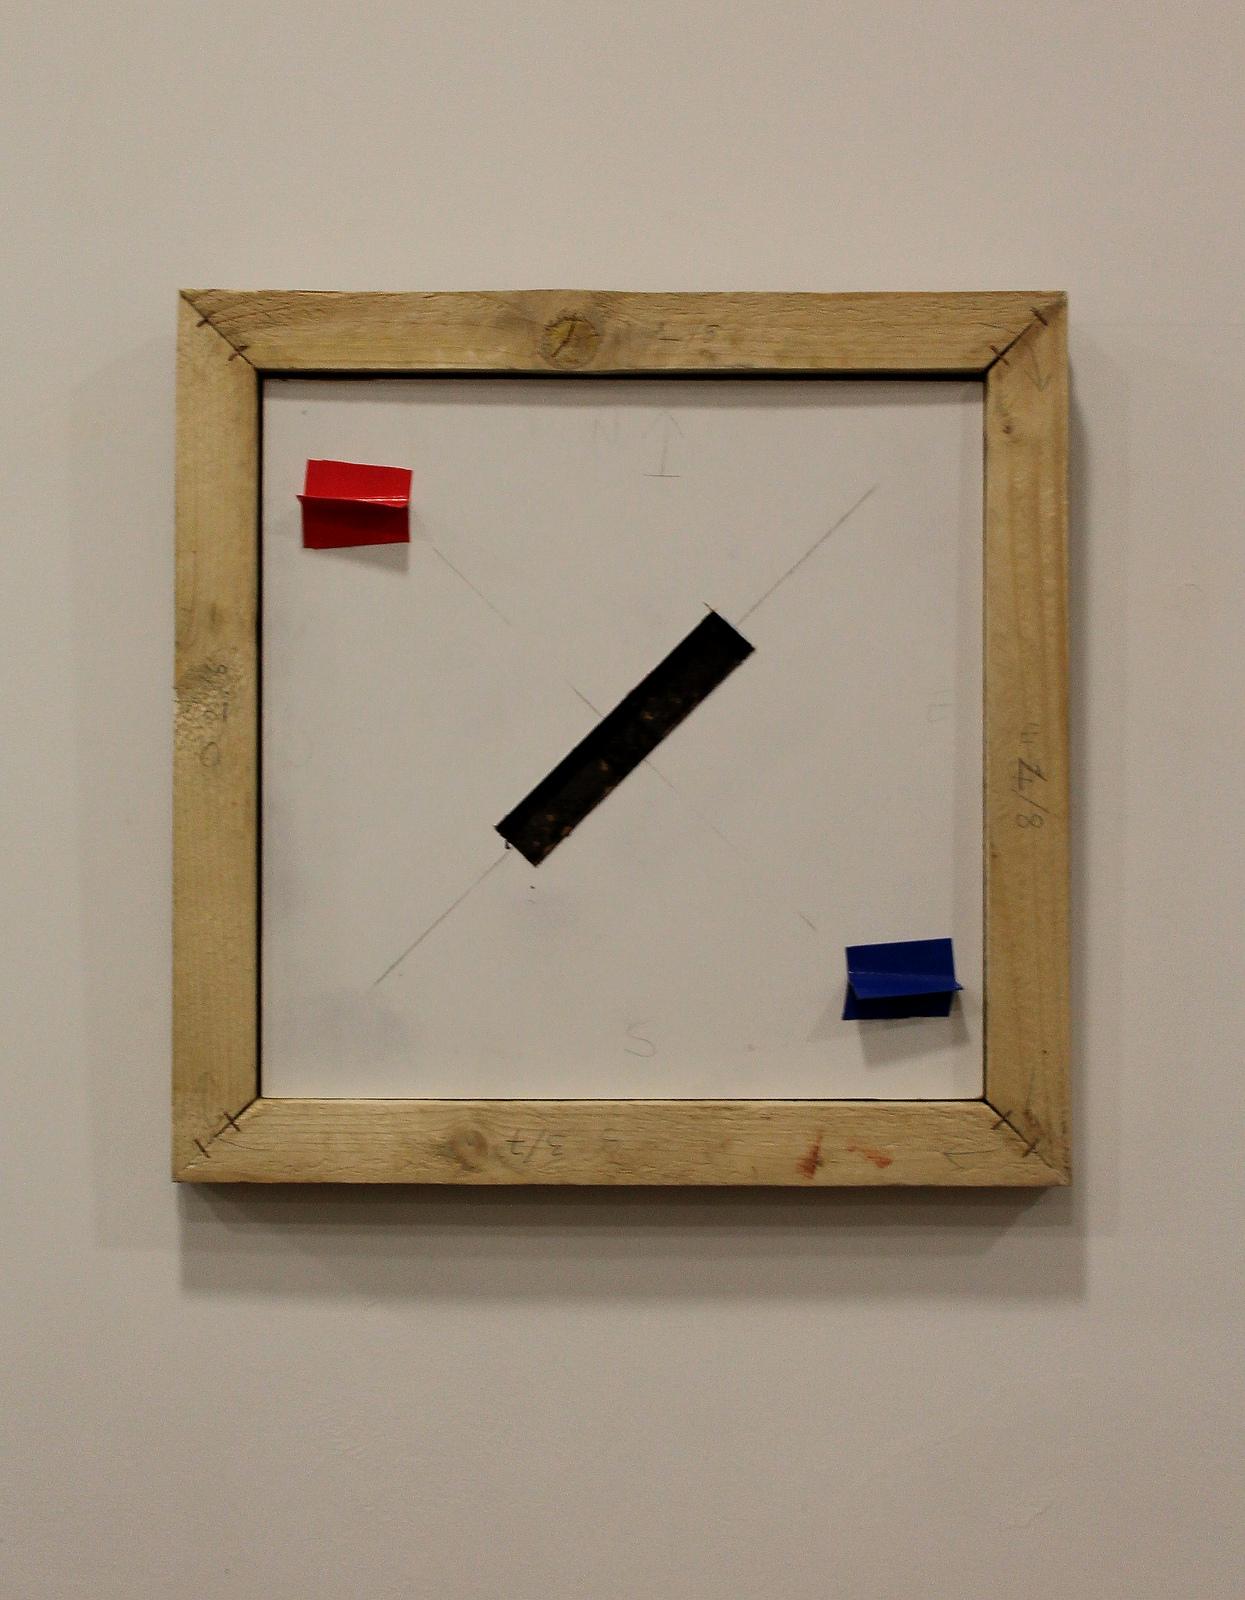 eltono-amalgama-at-galeria-slowtrack-canizares-recap-07